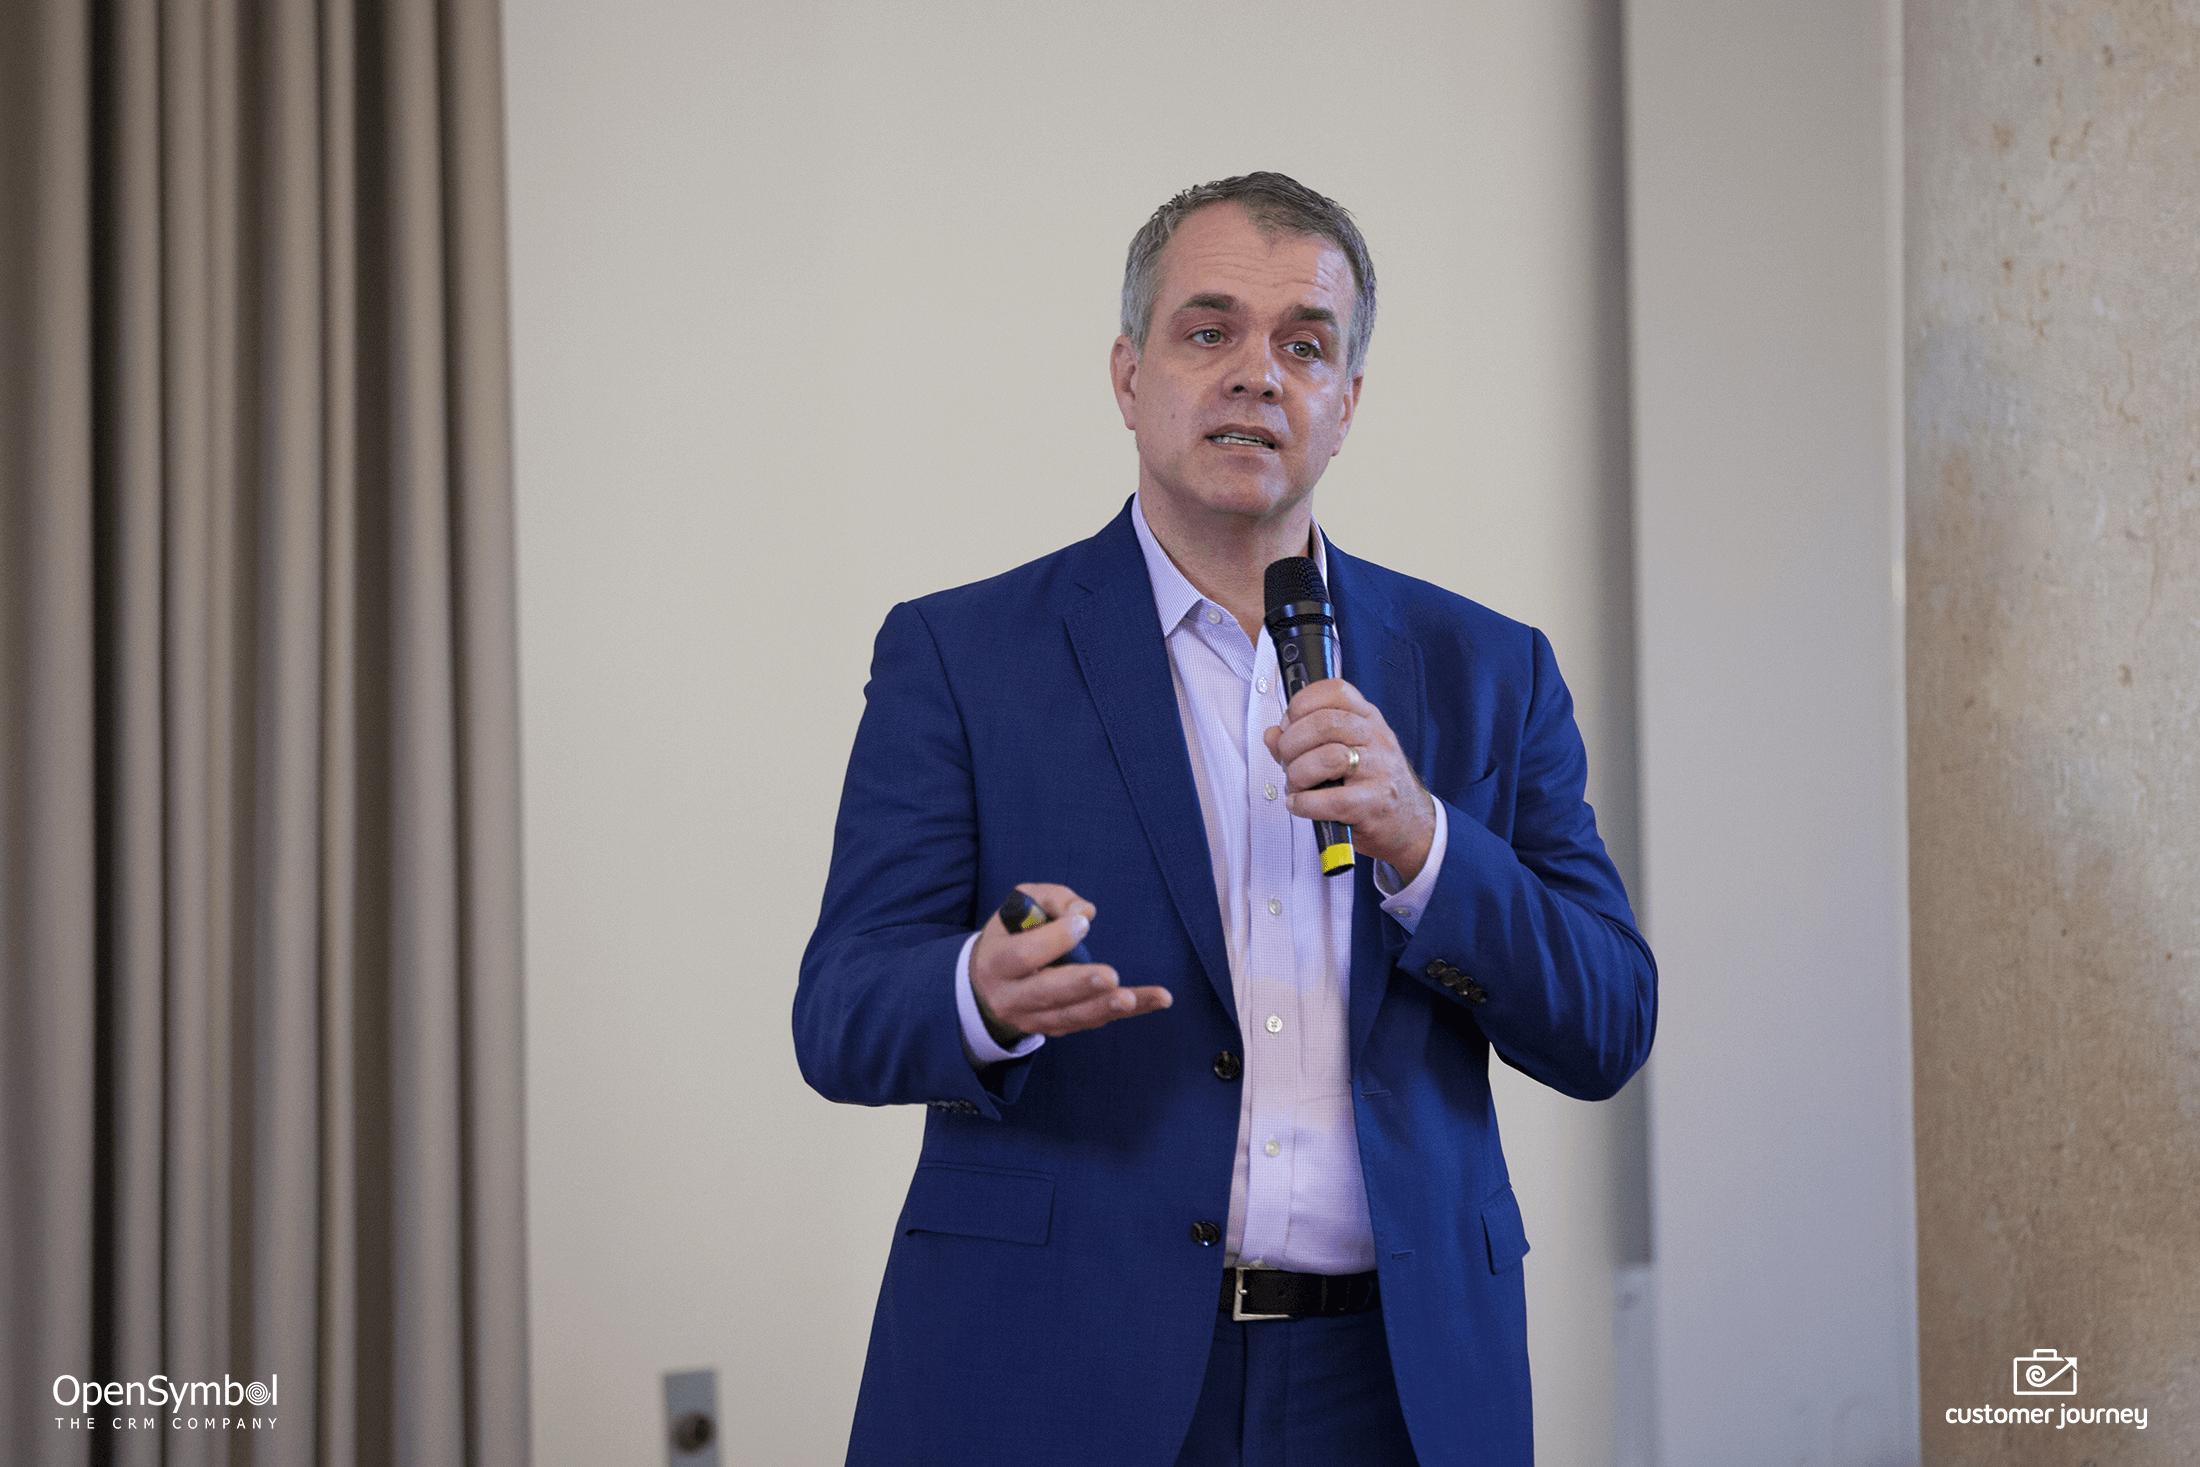 Le best practices di Marketing con il CRM: la parola a Clint Oram